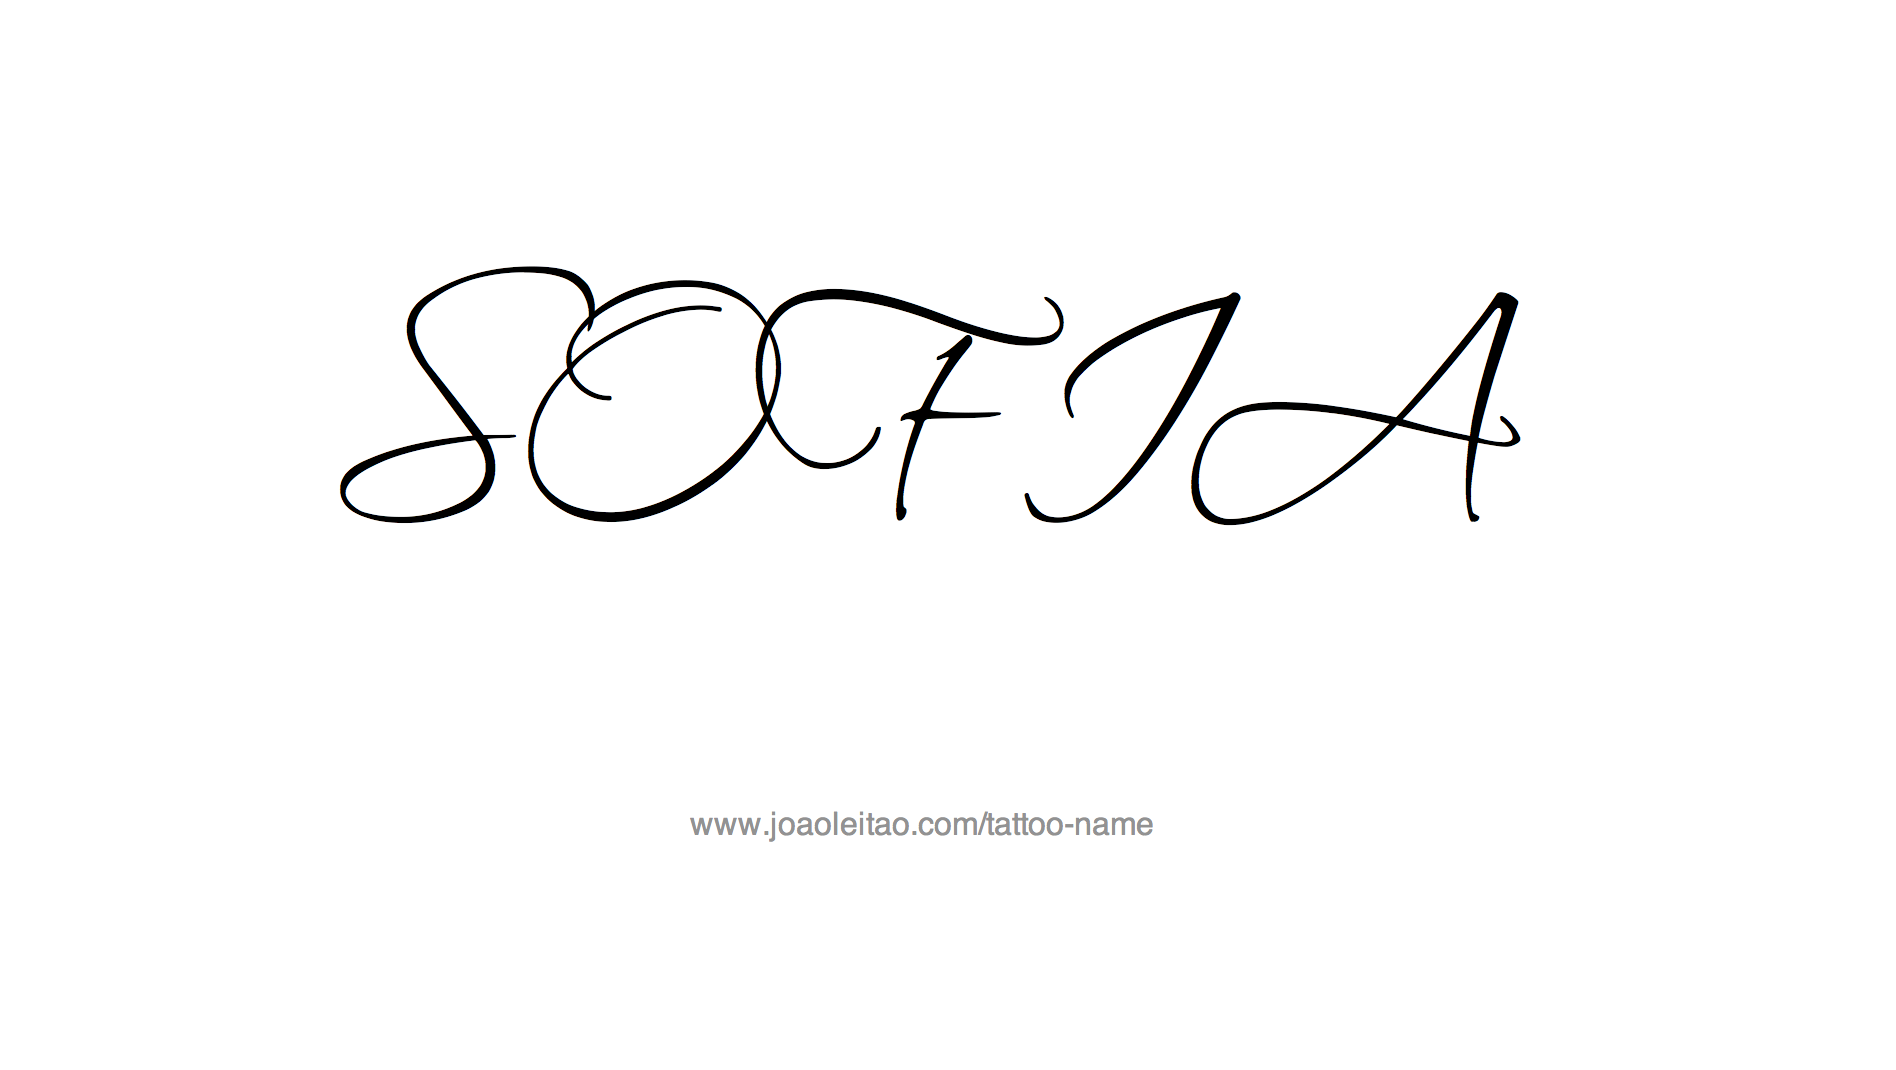 Sofia Name Tattoo Designs Tatuajes Tatuajes De Nombres Sofia